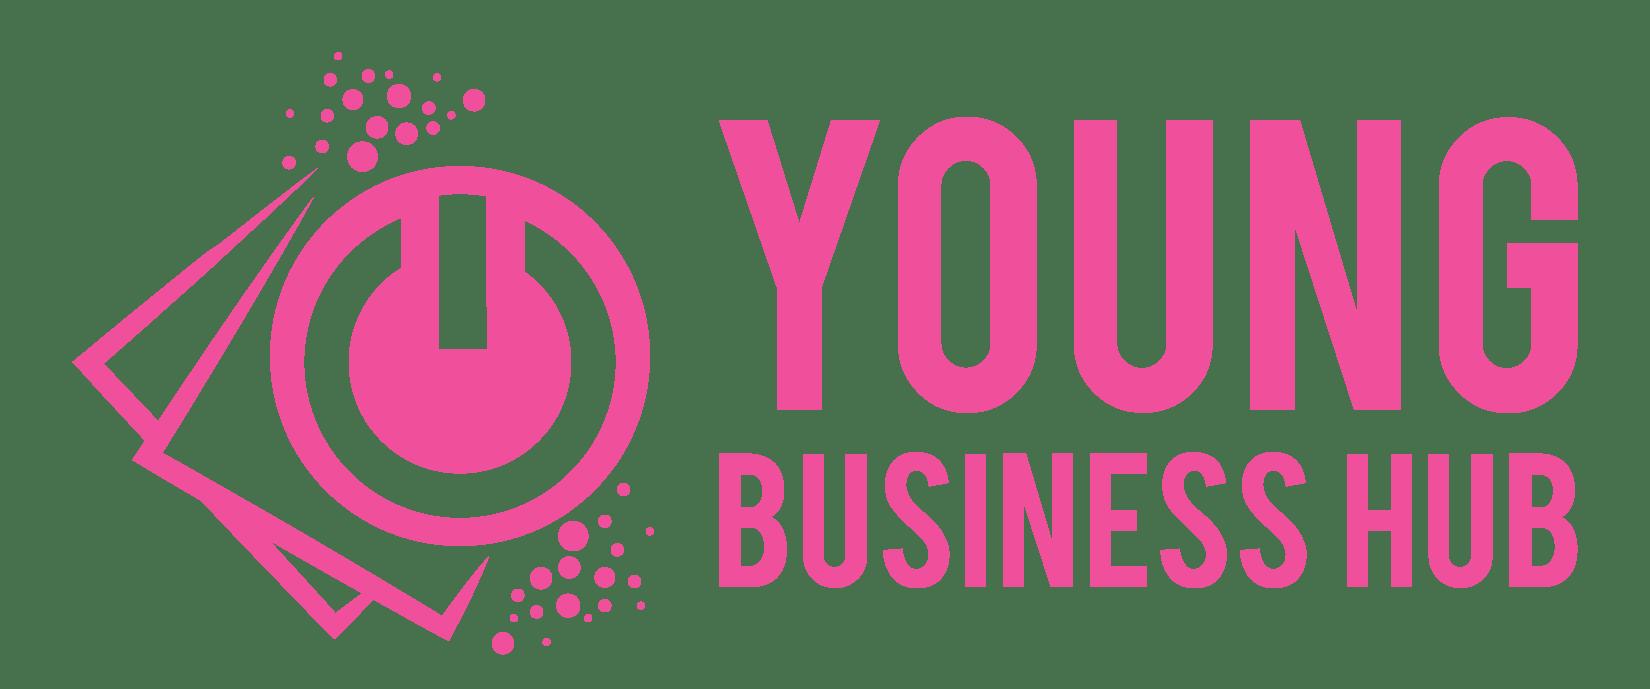 Startups Subpage